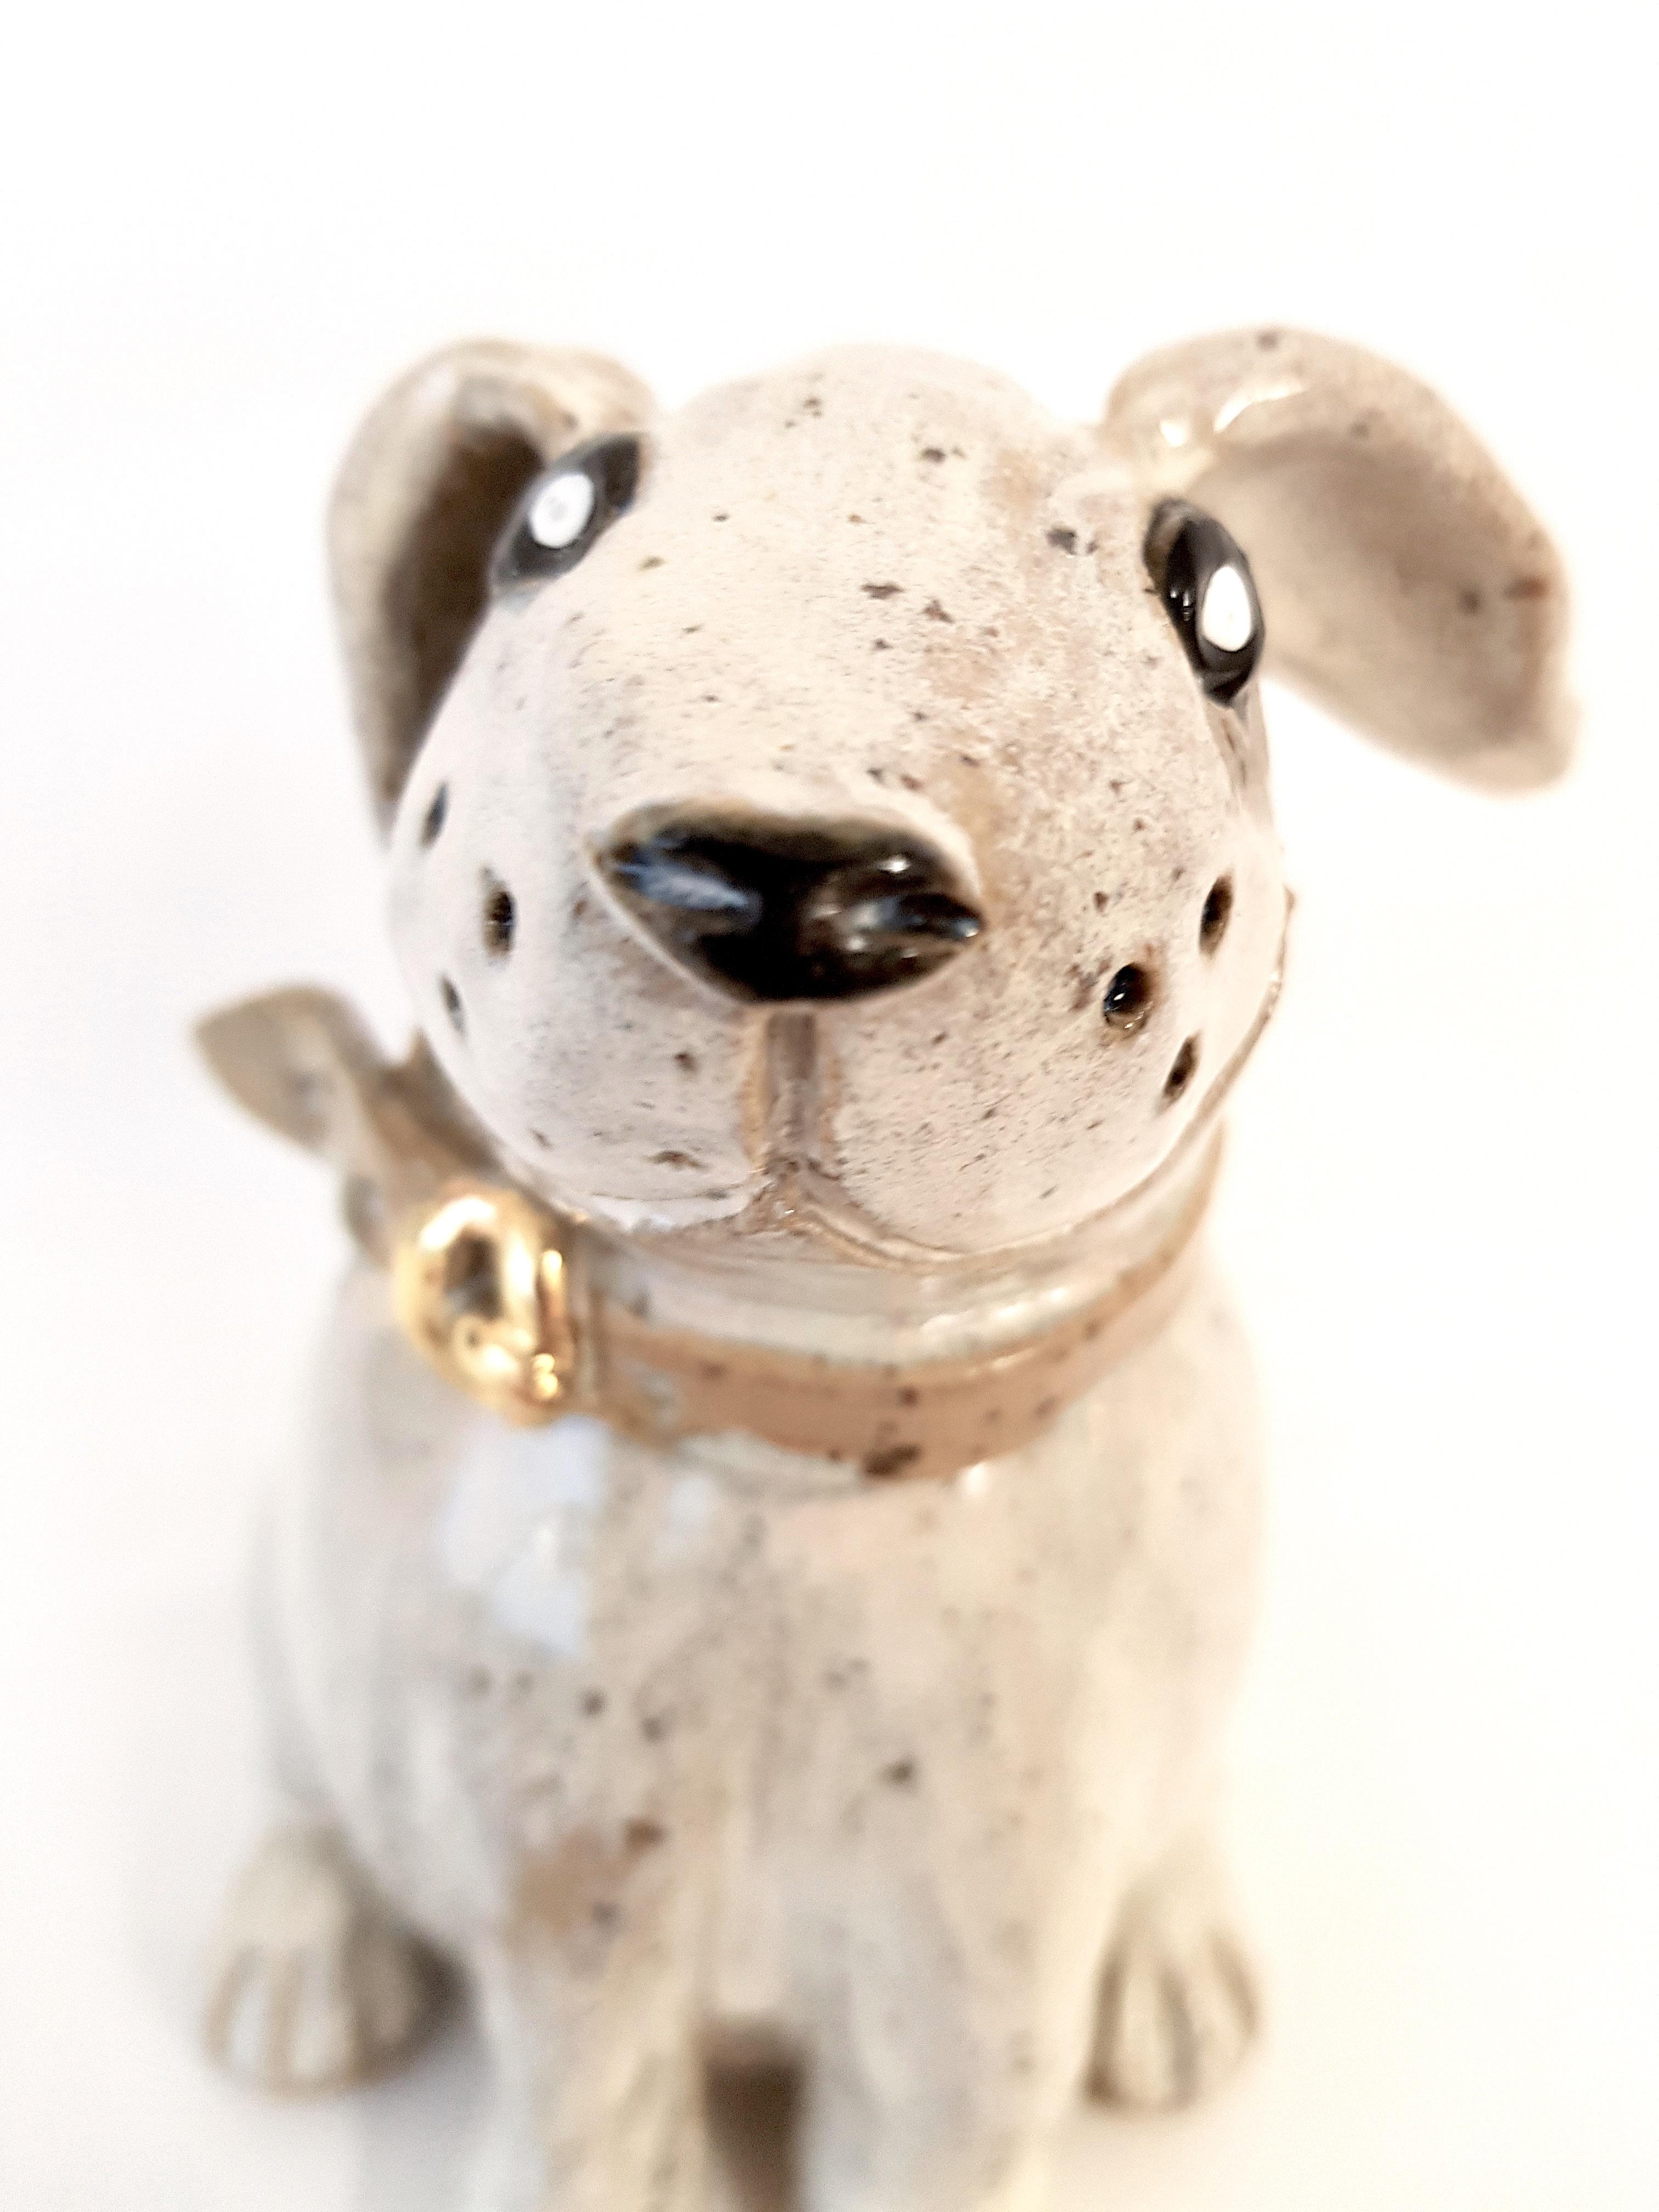 Keramikhund , Unikat, handmodelliert, handbemalt, Töpferei, La ceramica Basel, Töpferkurse